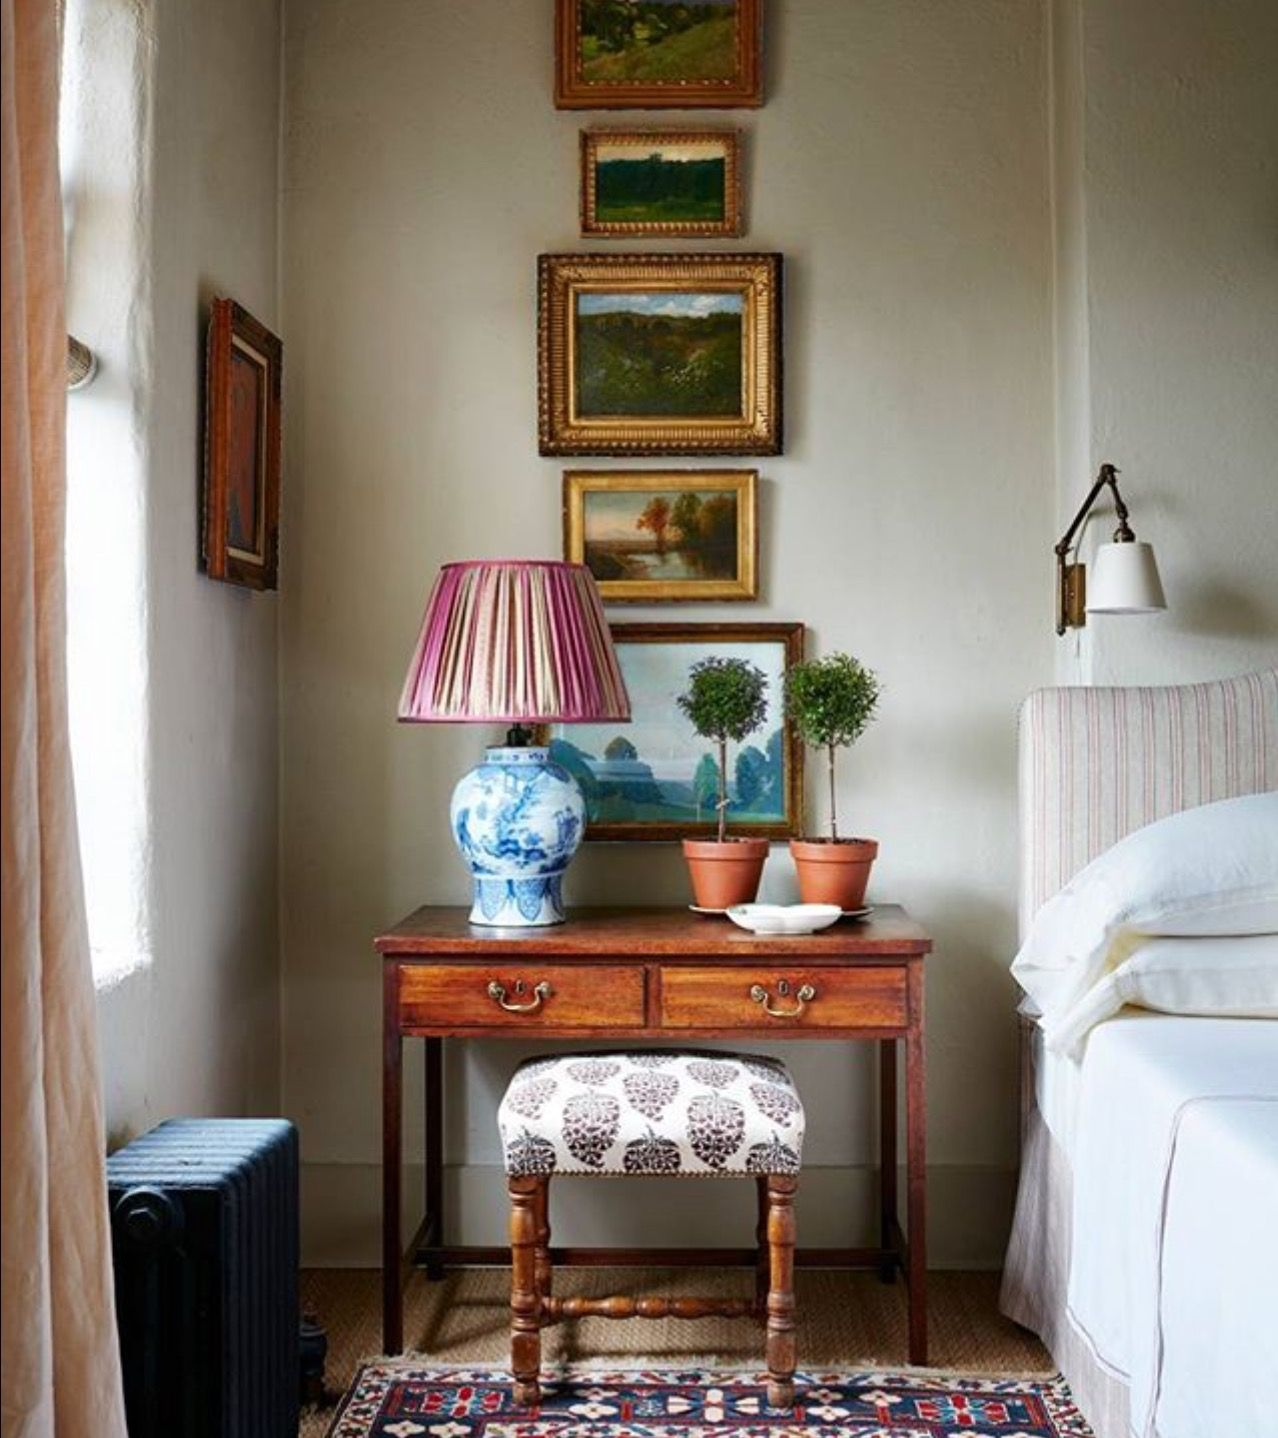 Pin by mitra montaser on get inspired in 2018 pinterest - Decoraciones de casas modernas ...